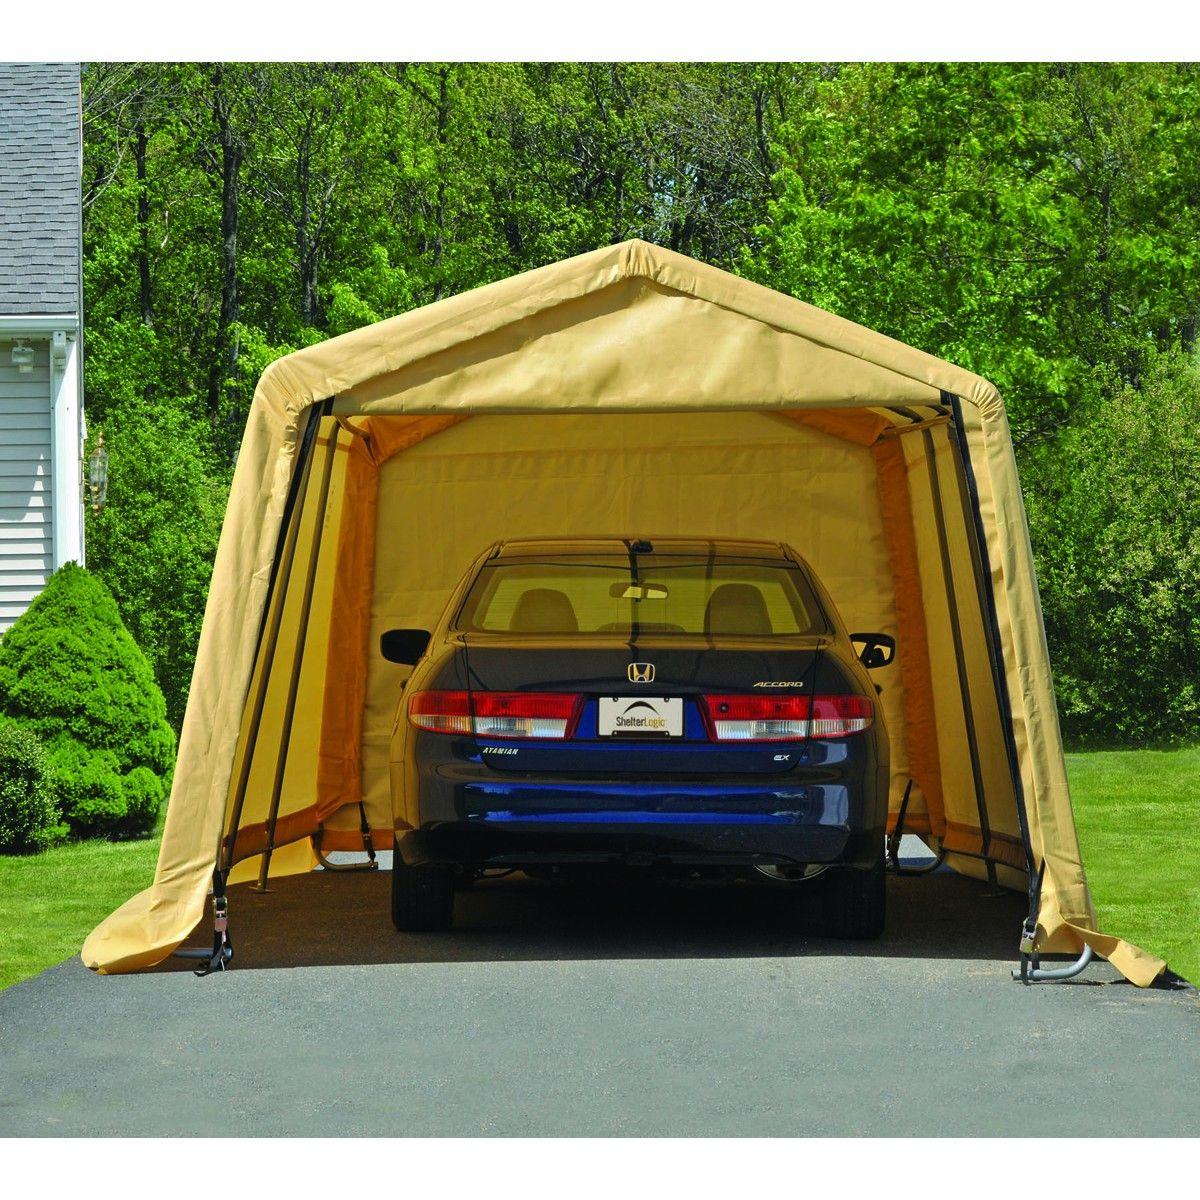 10 ft. x 20 ft. AutoShelter® Portable Garage   Portable ...